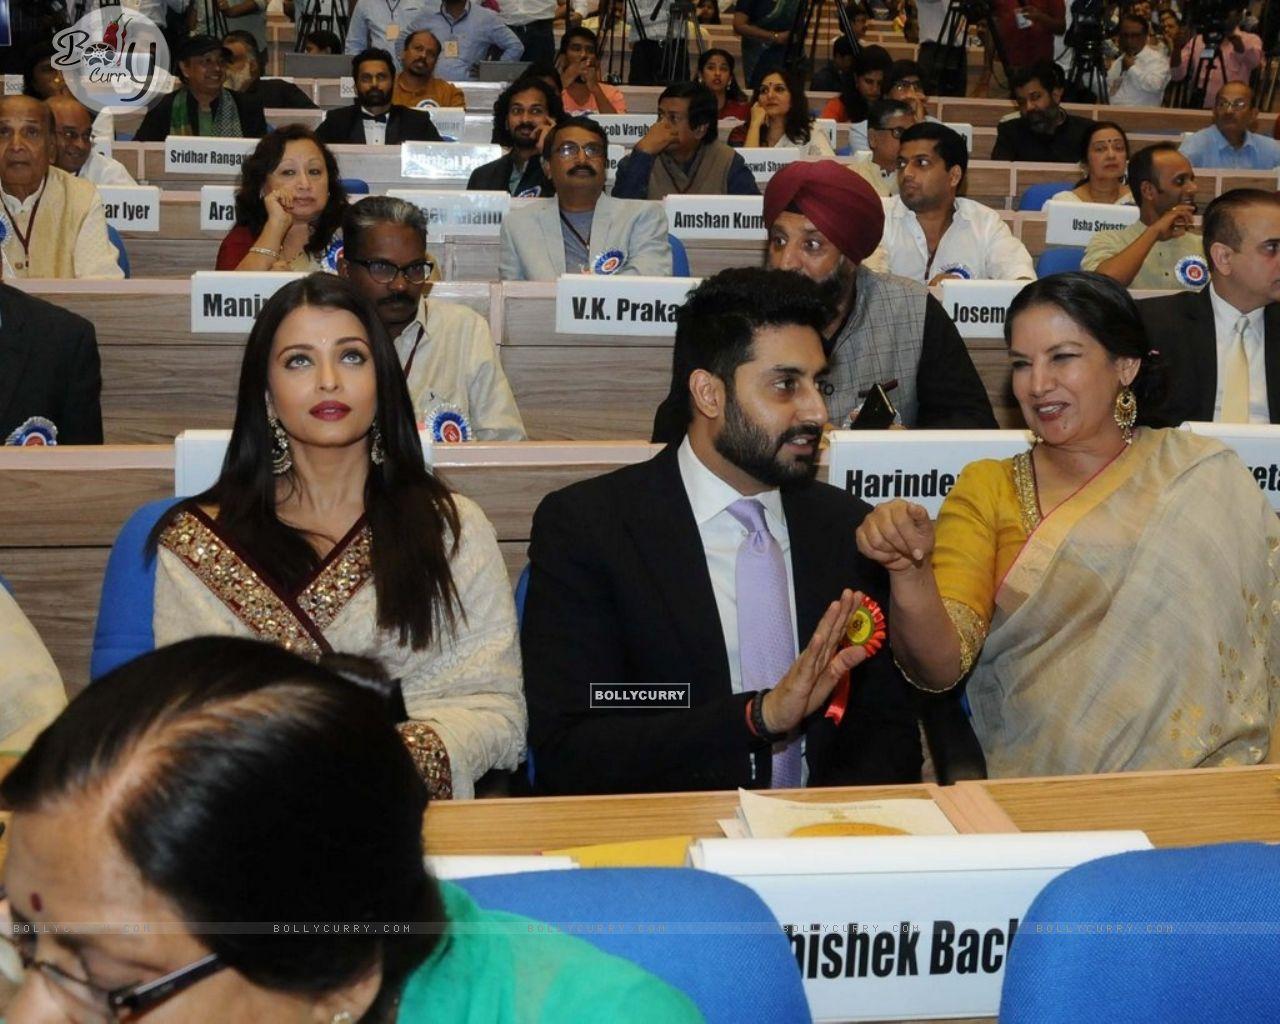 Jaya Bachchan, Aishwarya Rai Bachchan and Abhishek Bachchan at National Award Ceremony (405131) size:1280x1024